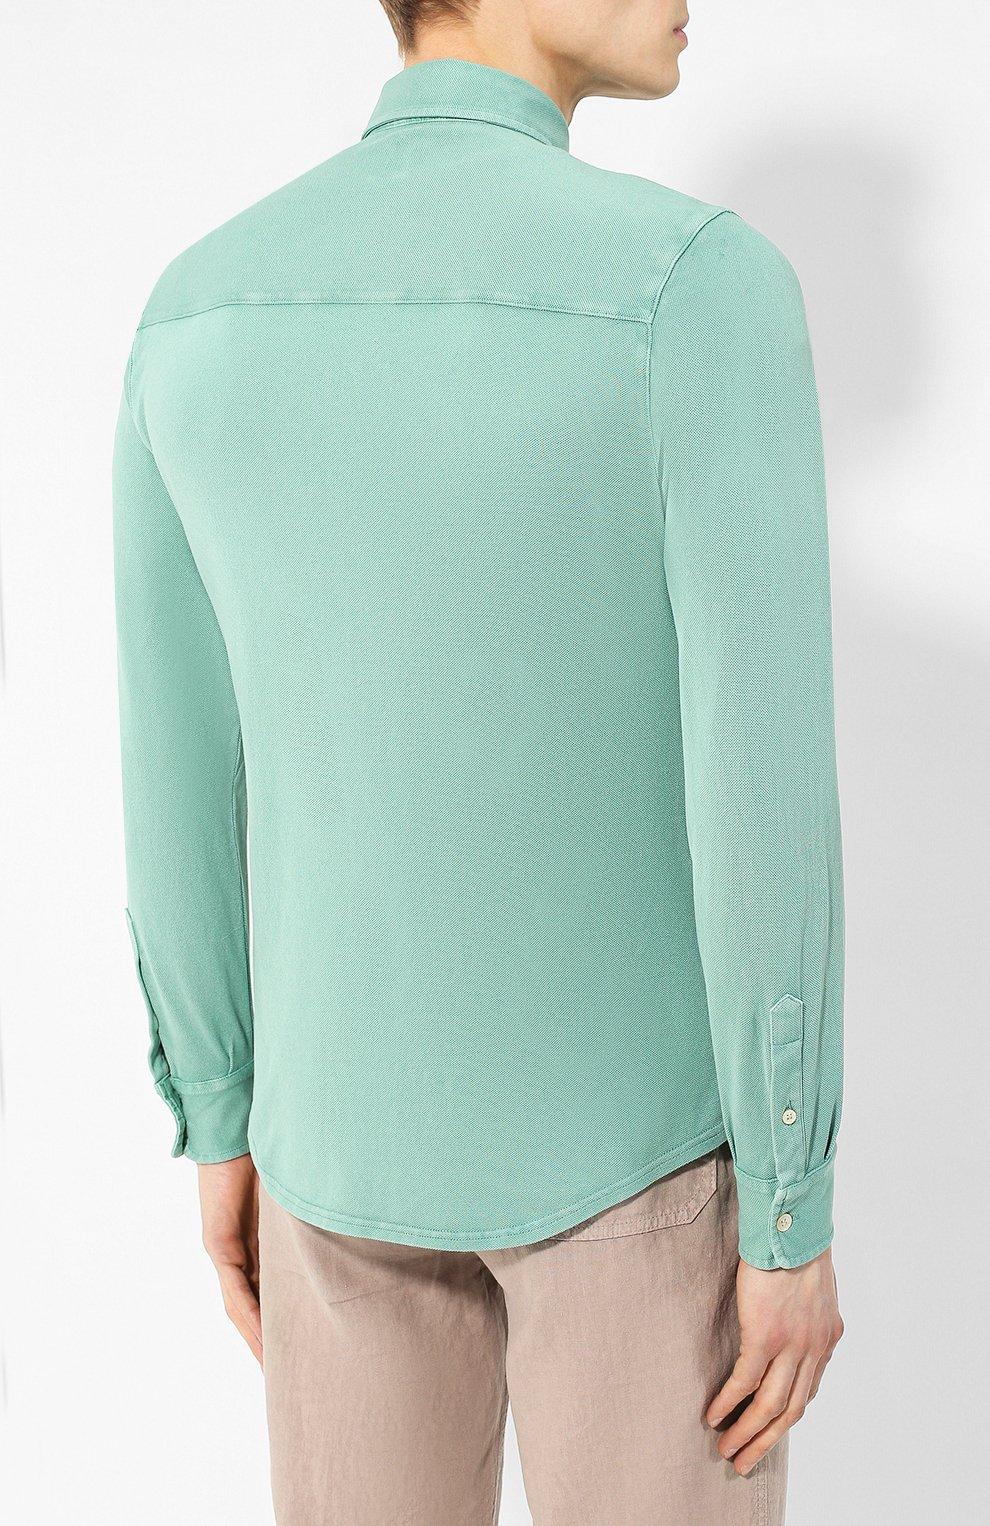 Хлопковая рубашка Fedeli светло-зеленая | Фото №4